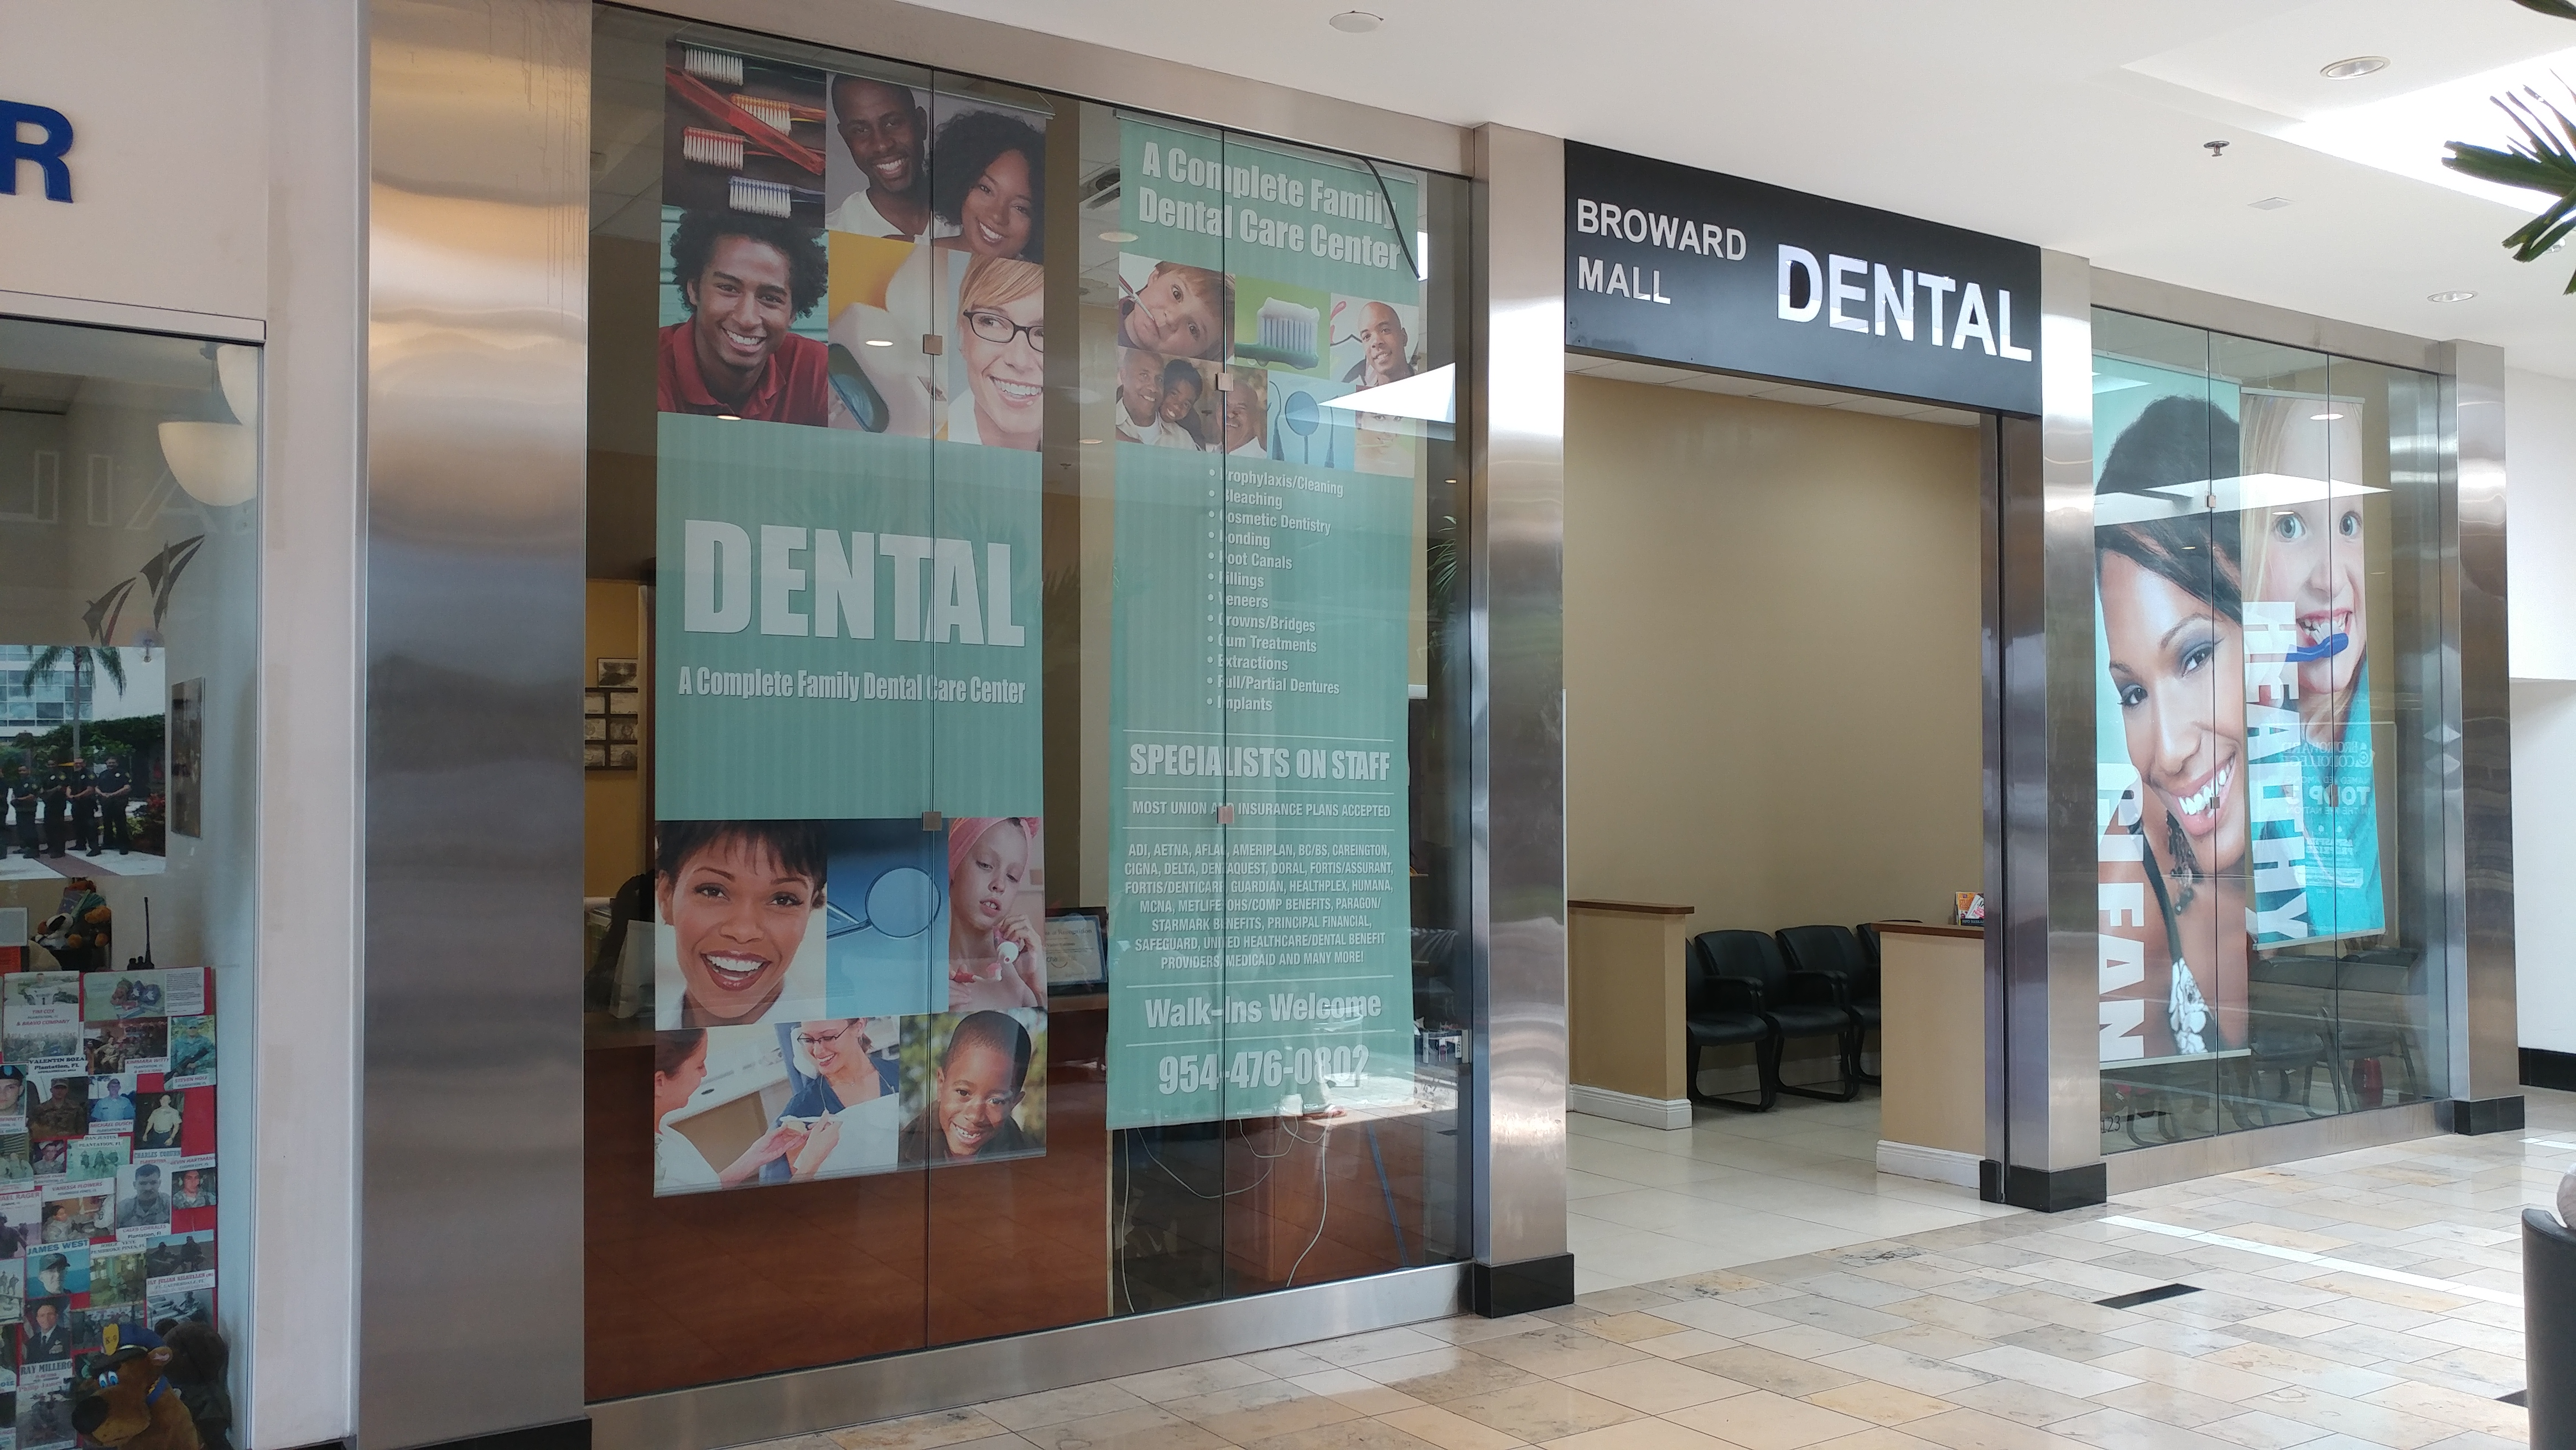 Dental Broward